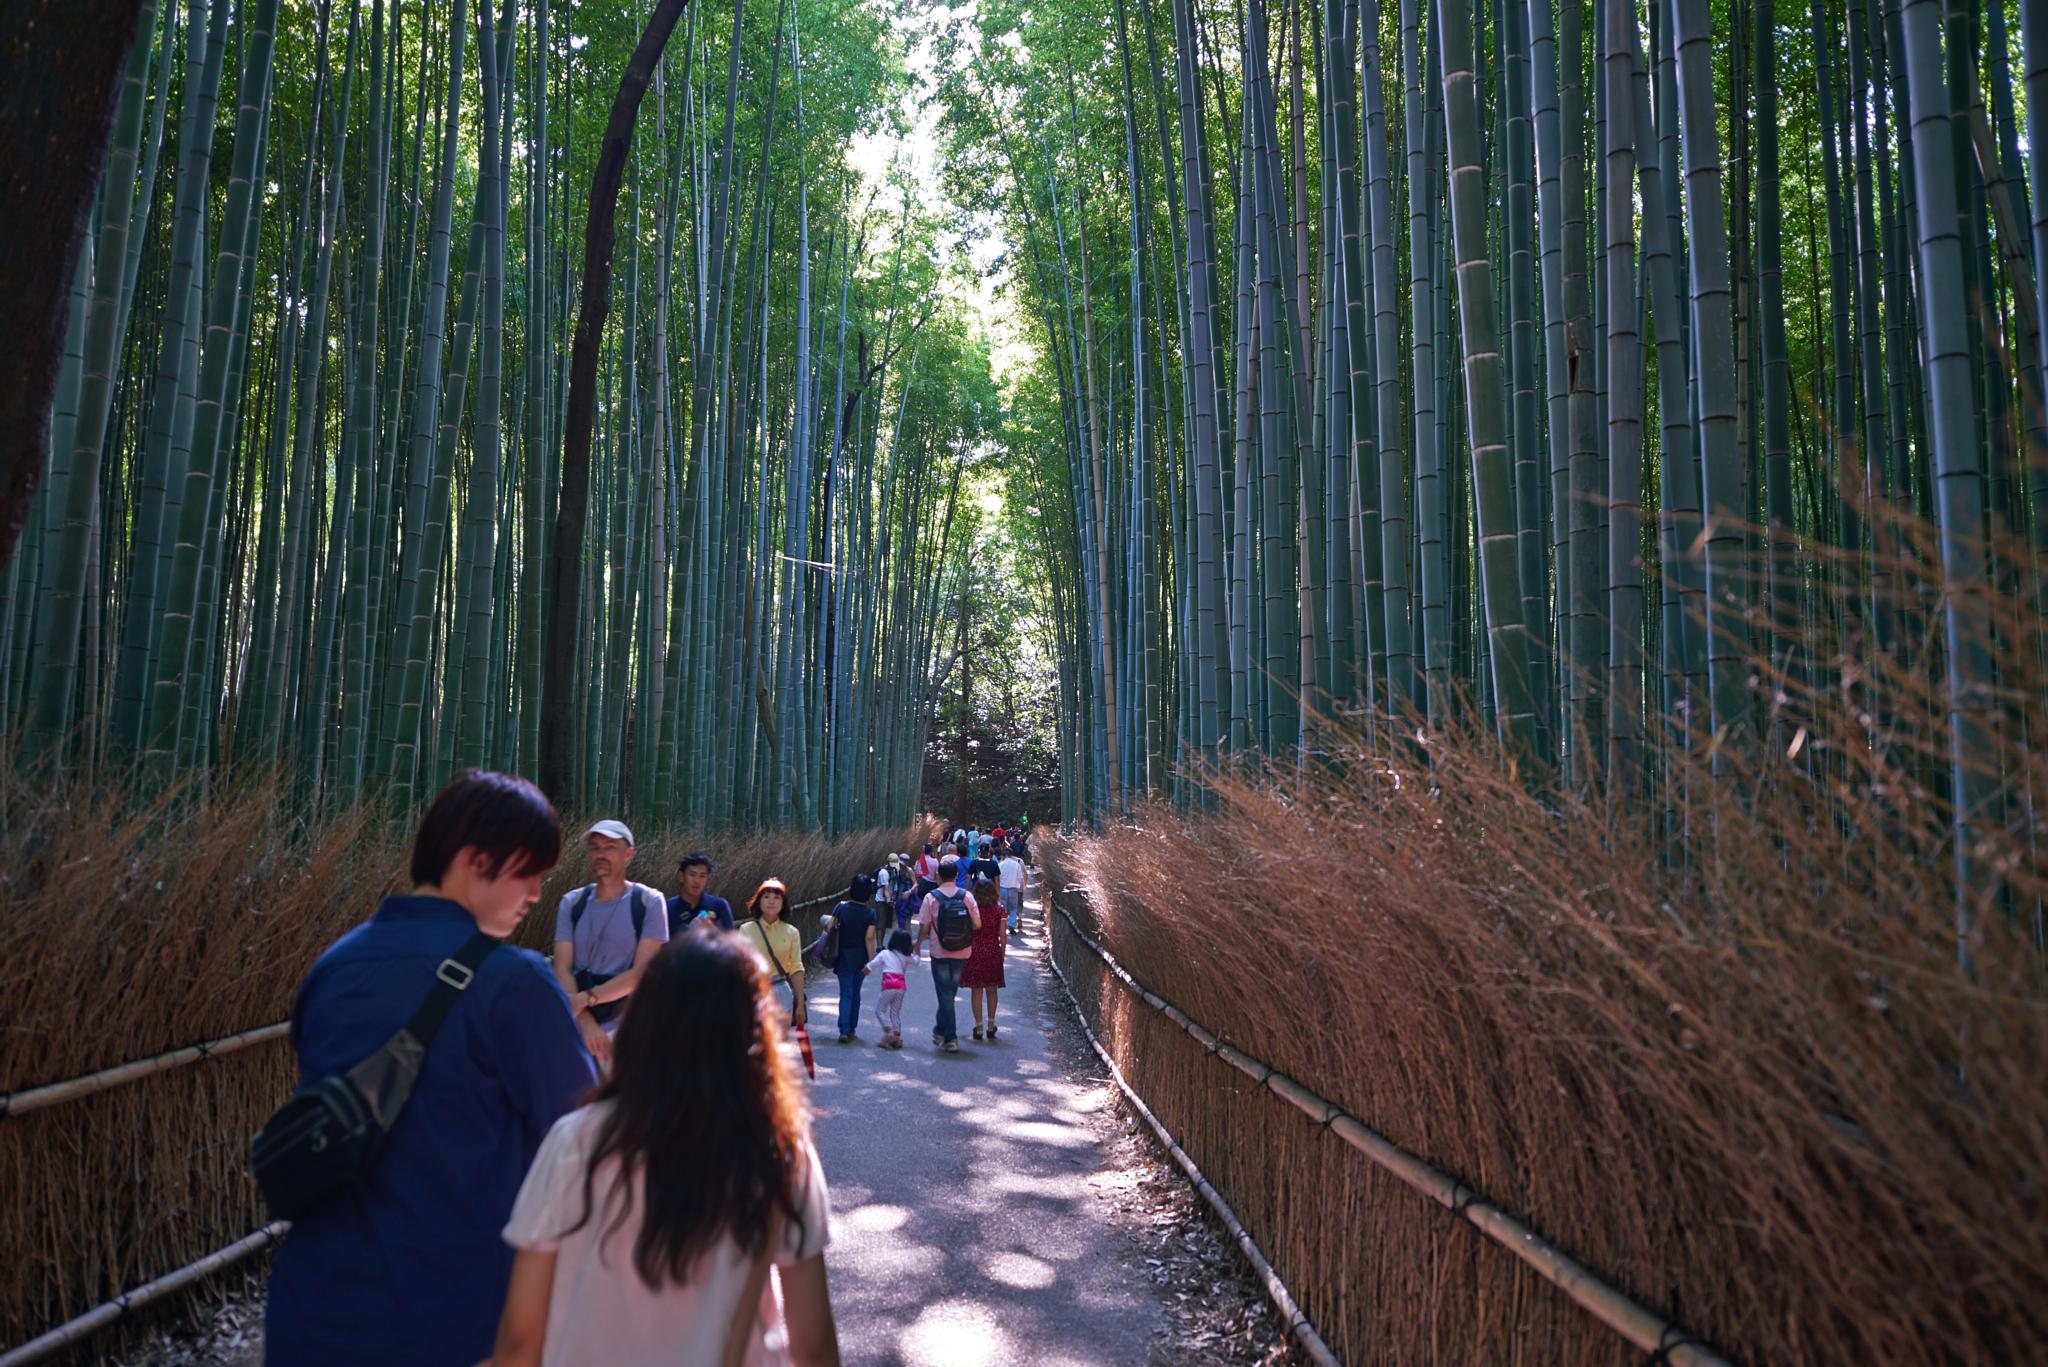 Bamboo walk by Antony Bunn